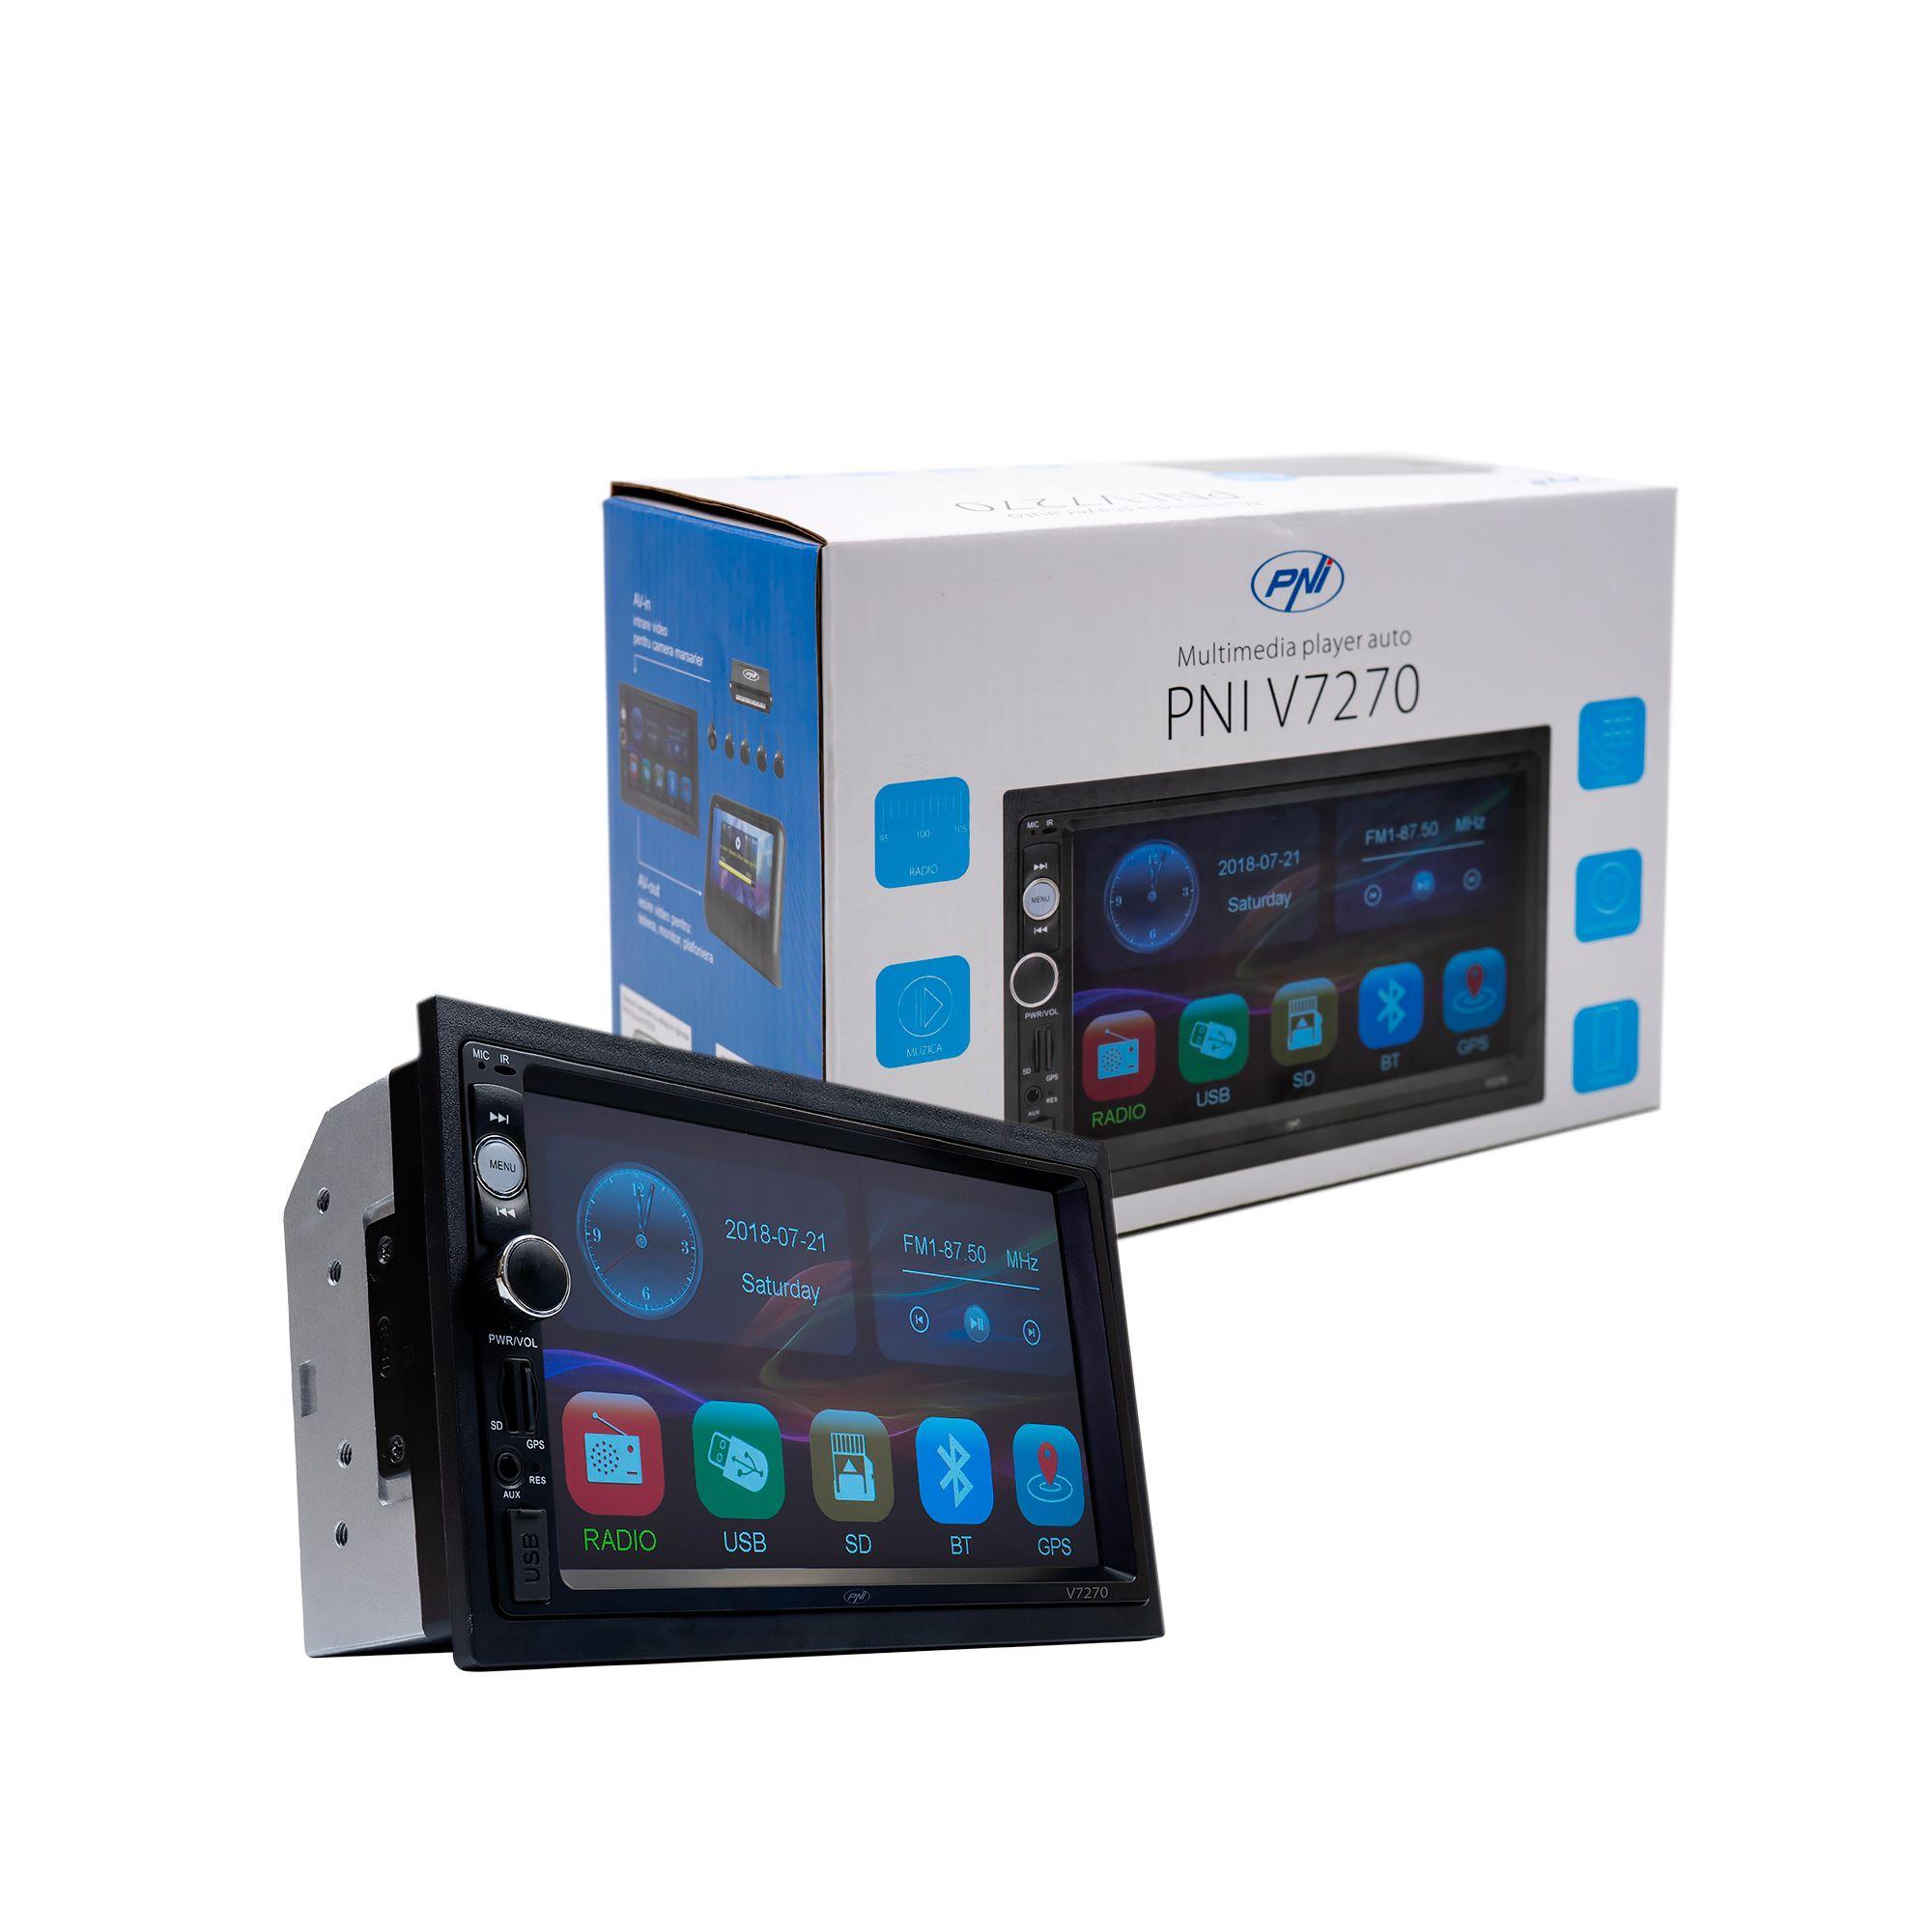 Универсална мултимедийна навигация двоен дин PNI V7270, MP5 GPS, Bluetooth, 7 инча